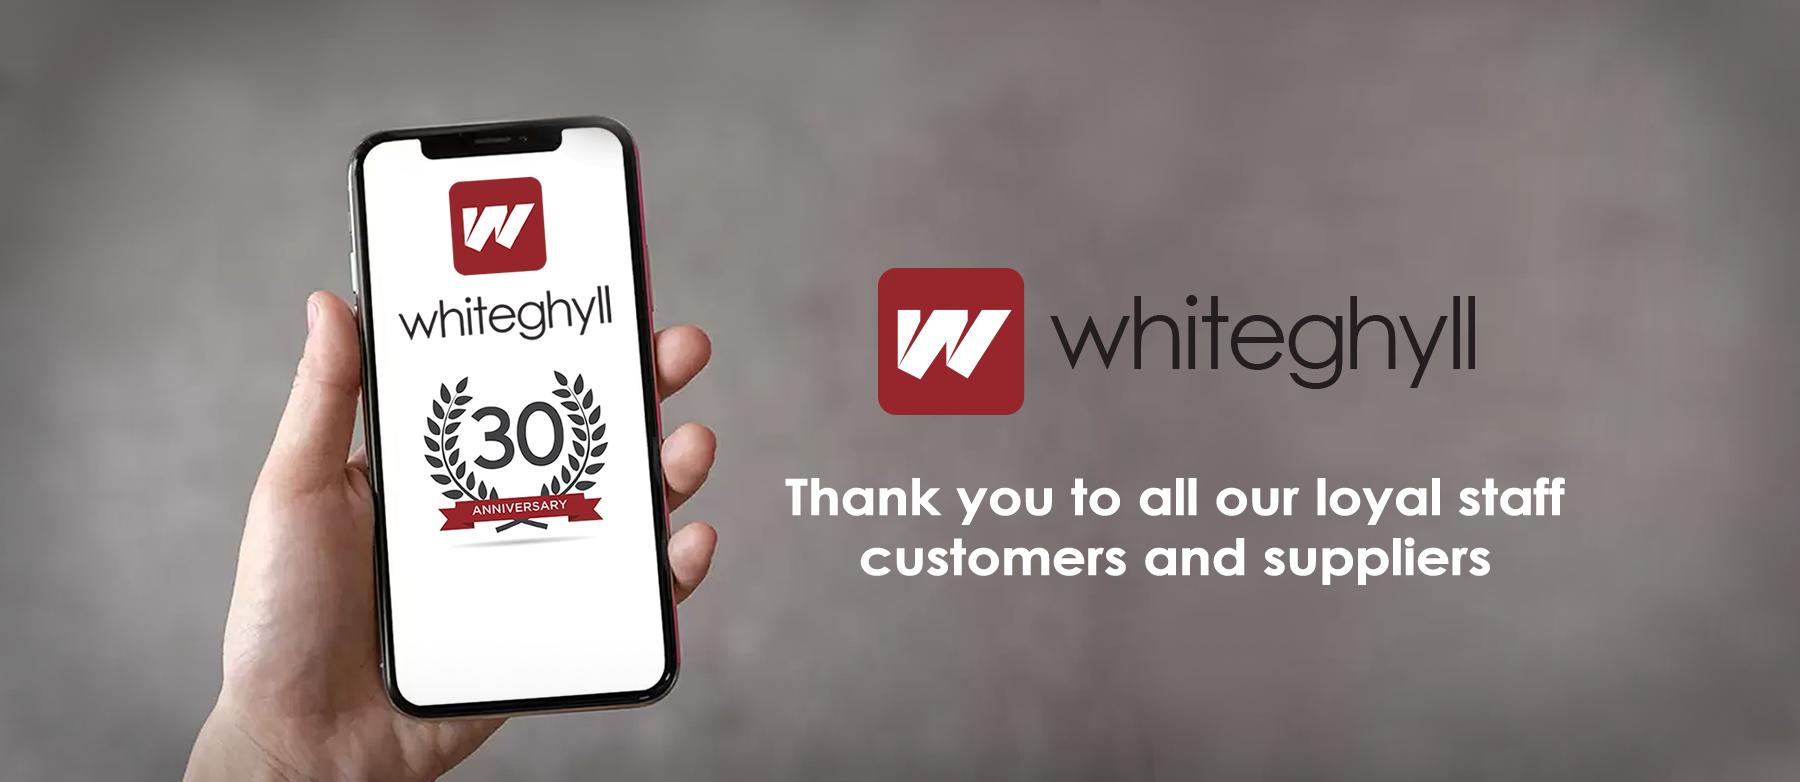 Happy Birthday to Whiteghyll - Whiteghyll_30_years